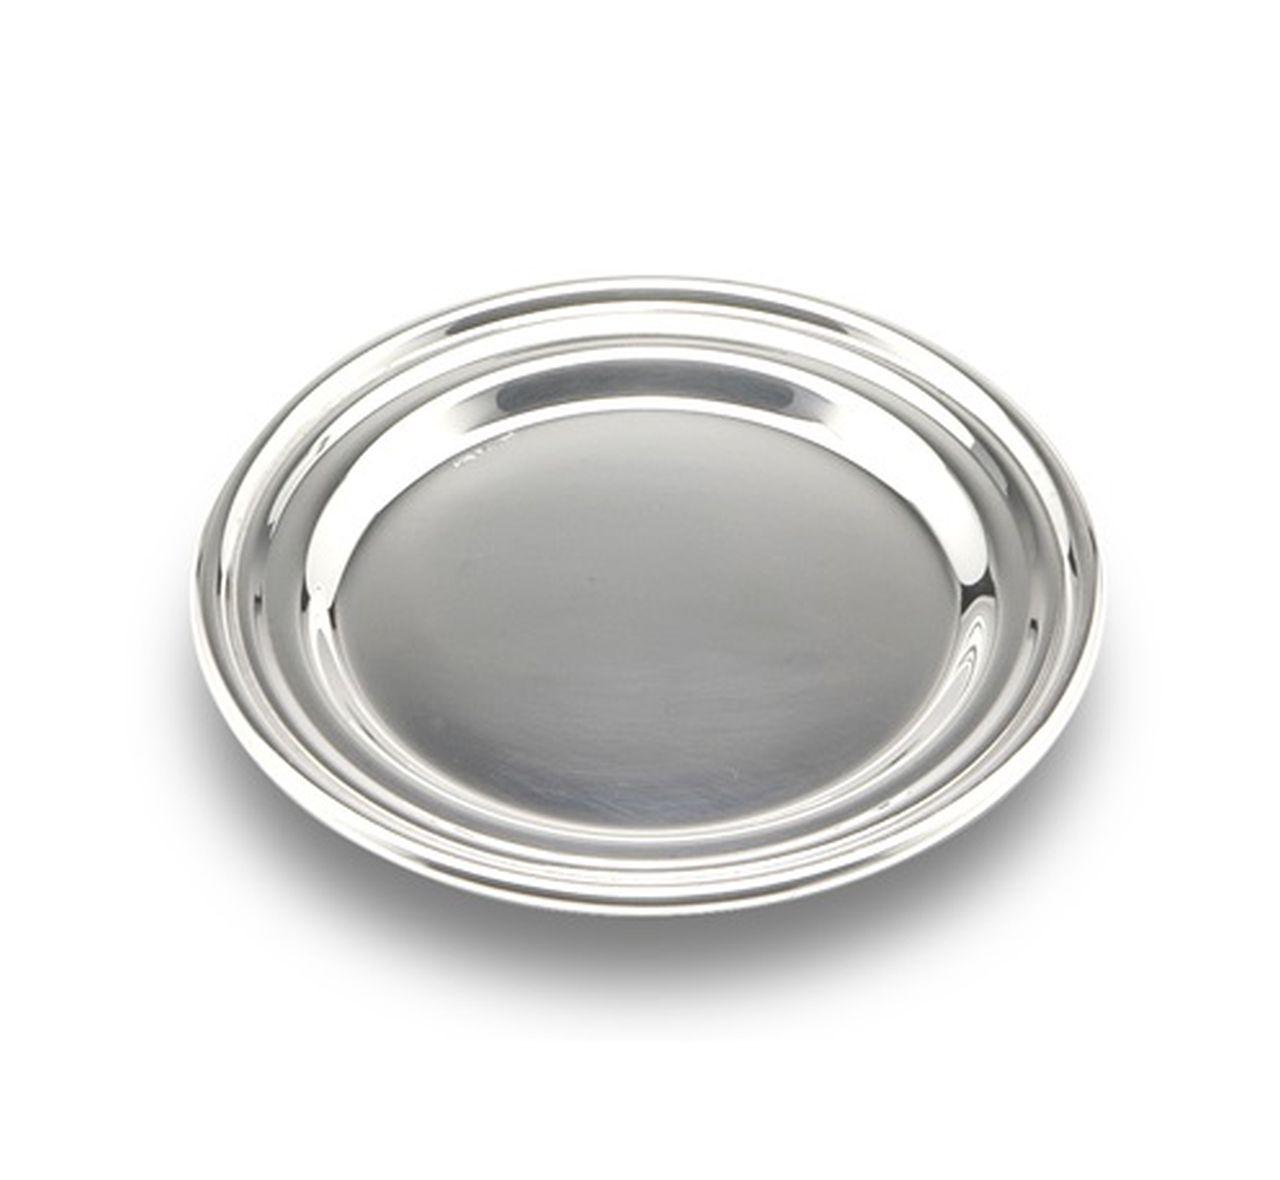 Sottobicchiere in metallo placcato argento stile Inglese cm.0,5h diam.11